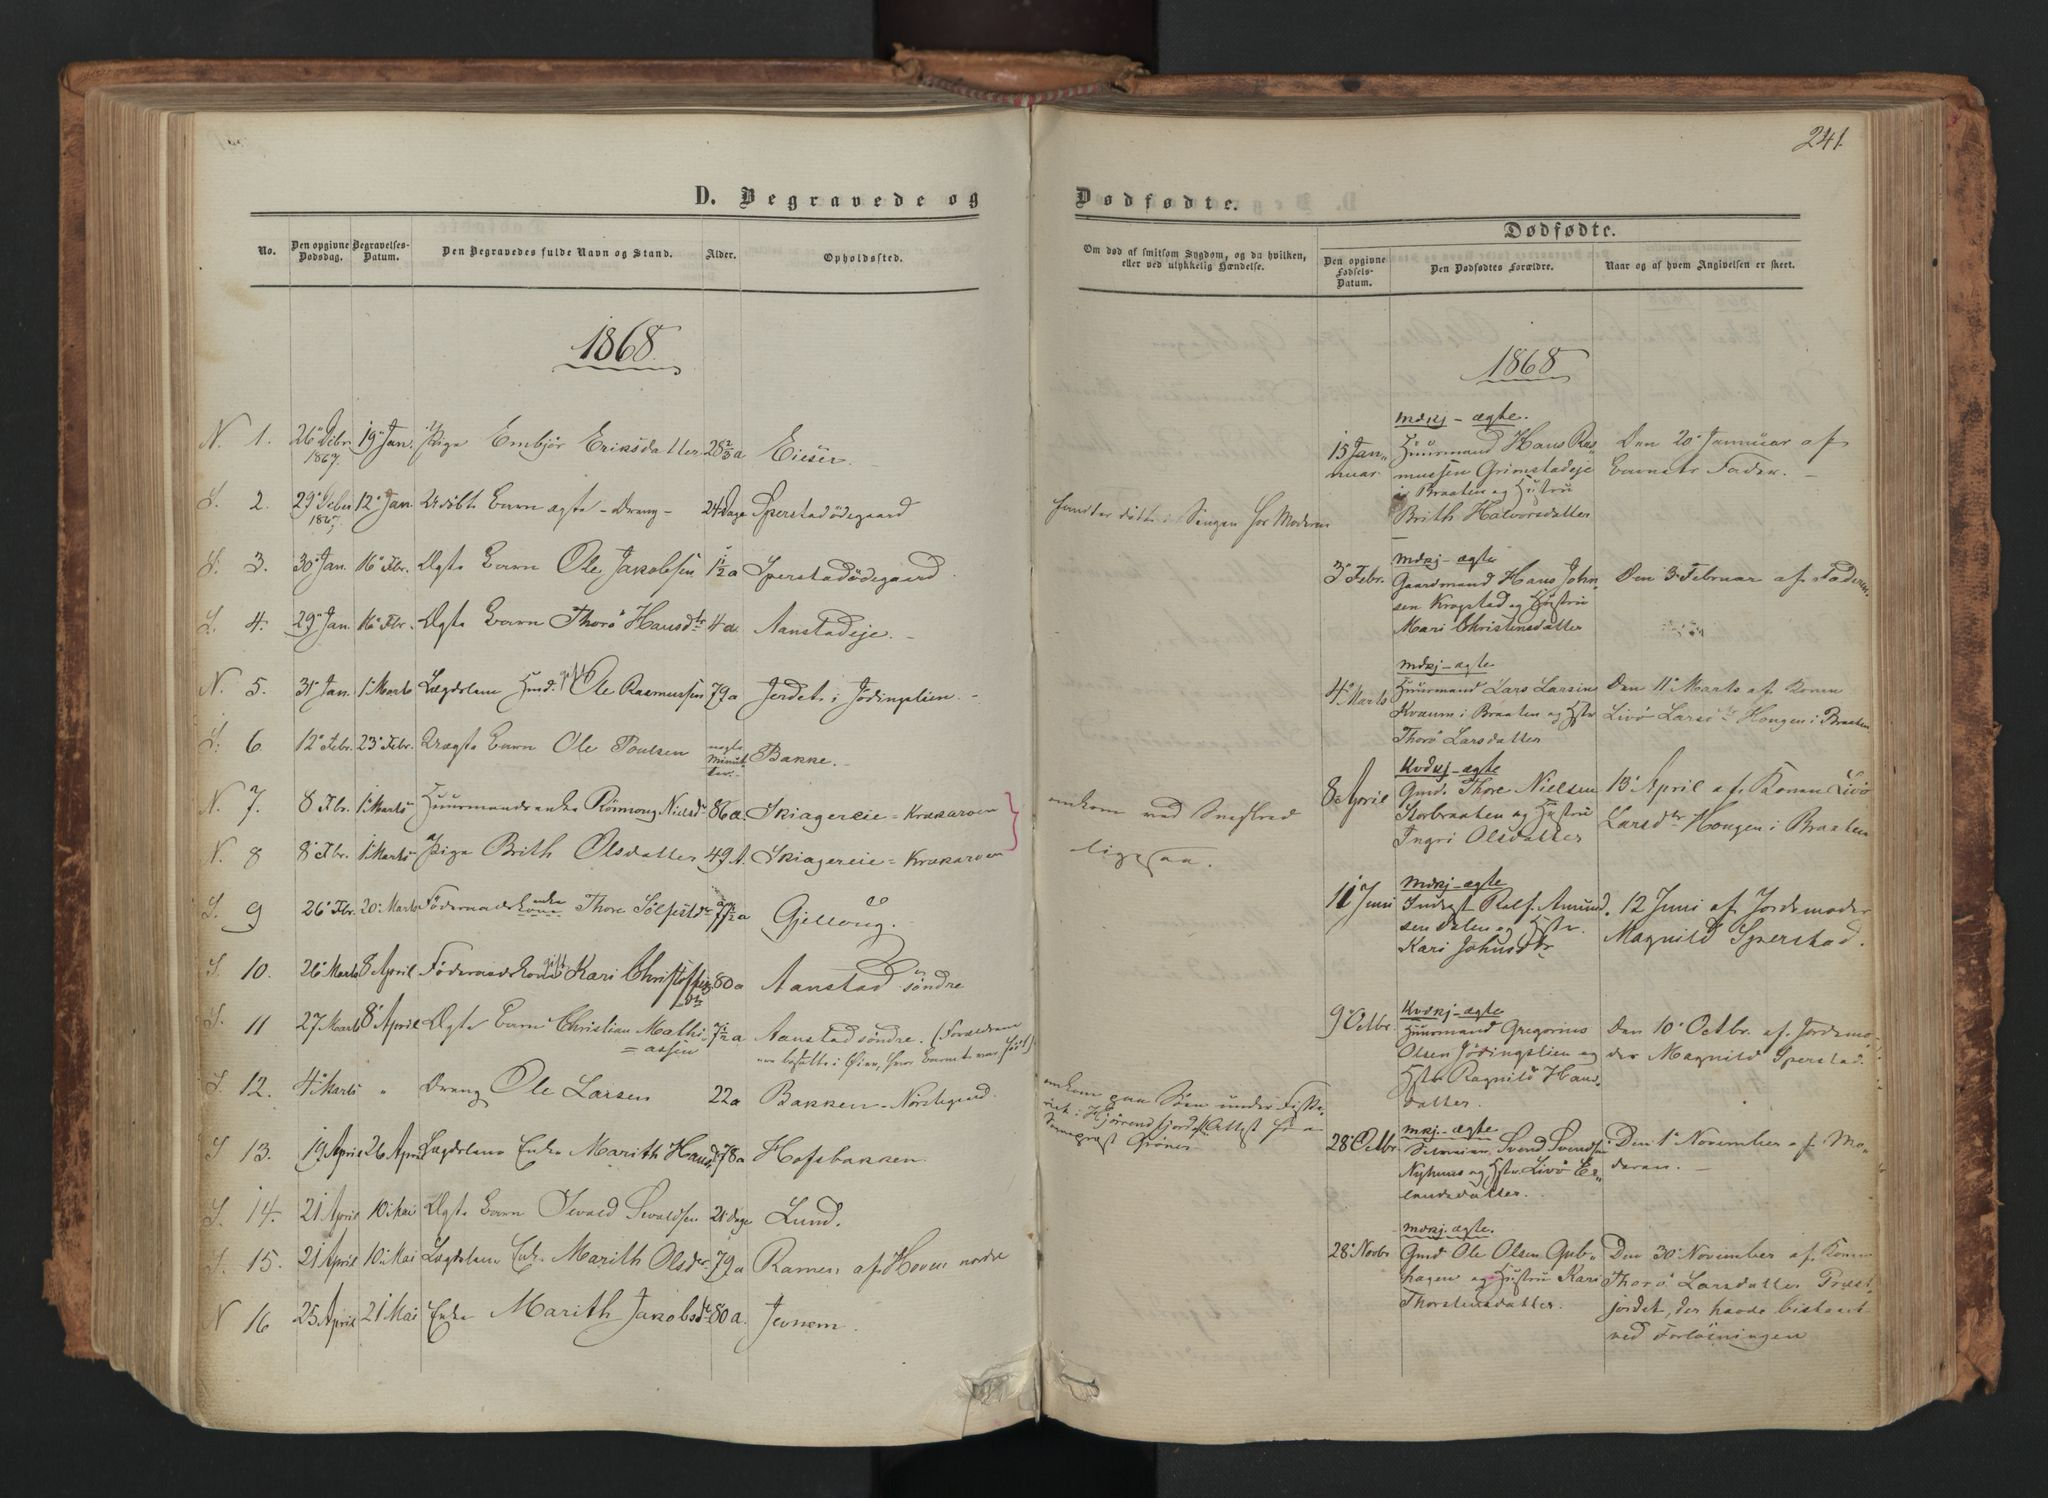 SAH, Skjåk prestekontor, Ministerialbok nr. 1, 1863-1879, s. 241